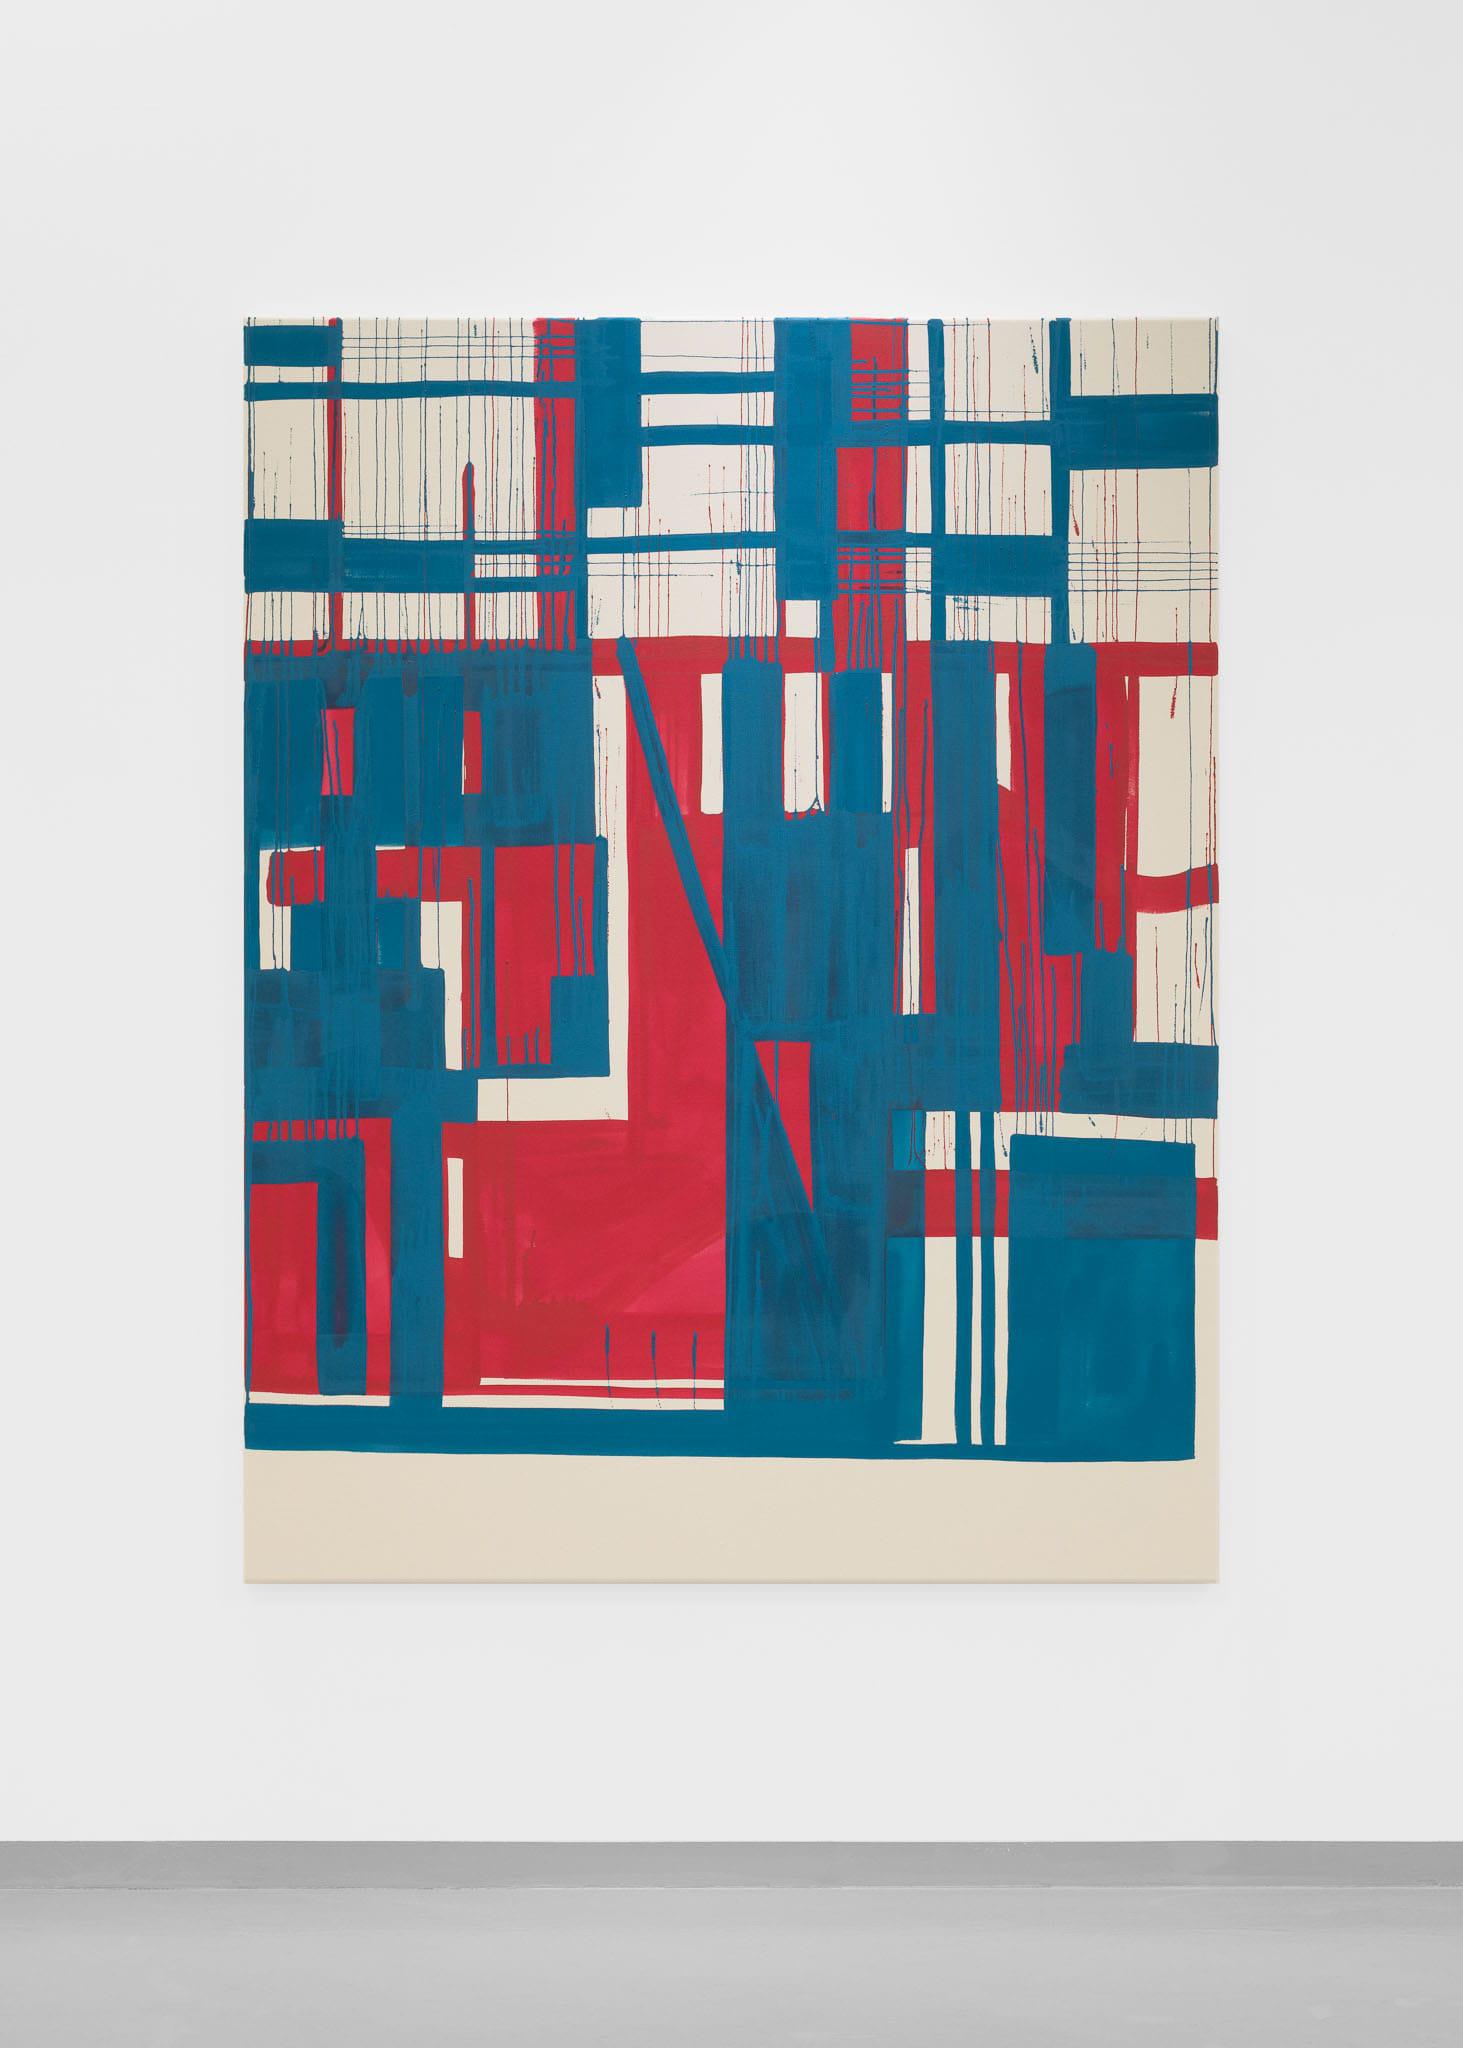 En tematisk vinkling er å ta utgangspunkt i arkitekturen, II   2019 Acrylic on raw canvas 169 x 130 cm Photo: Erik Sæter Jørgensen